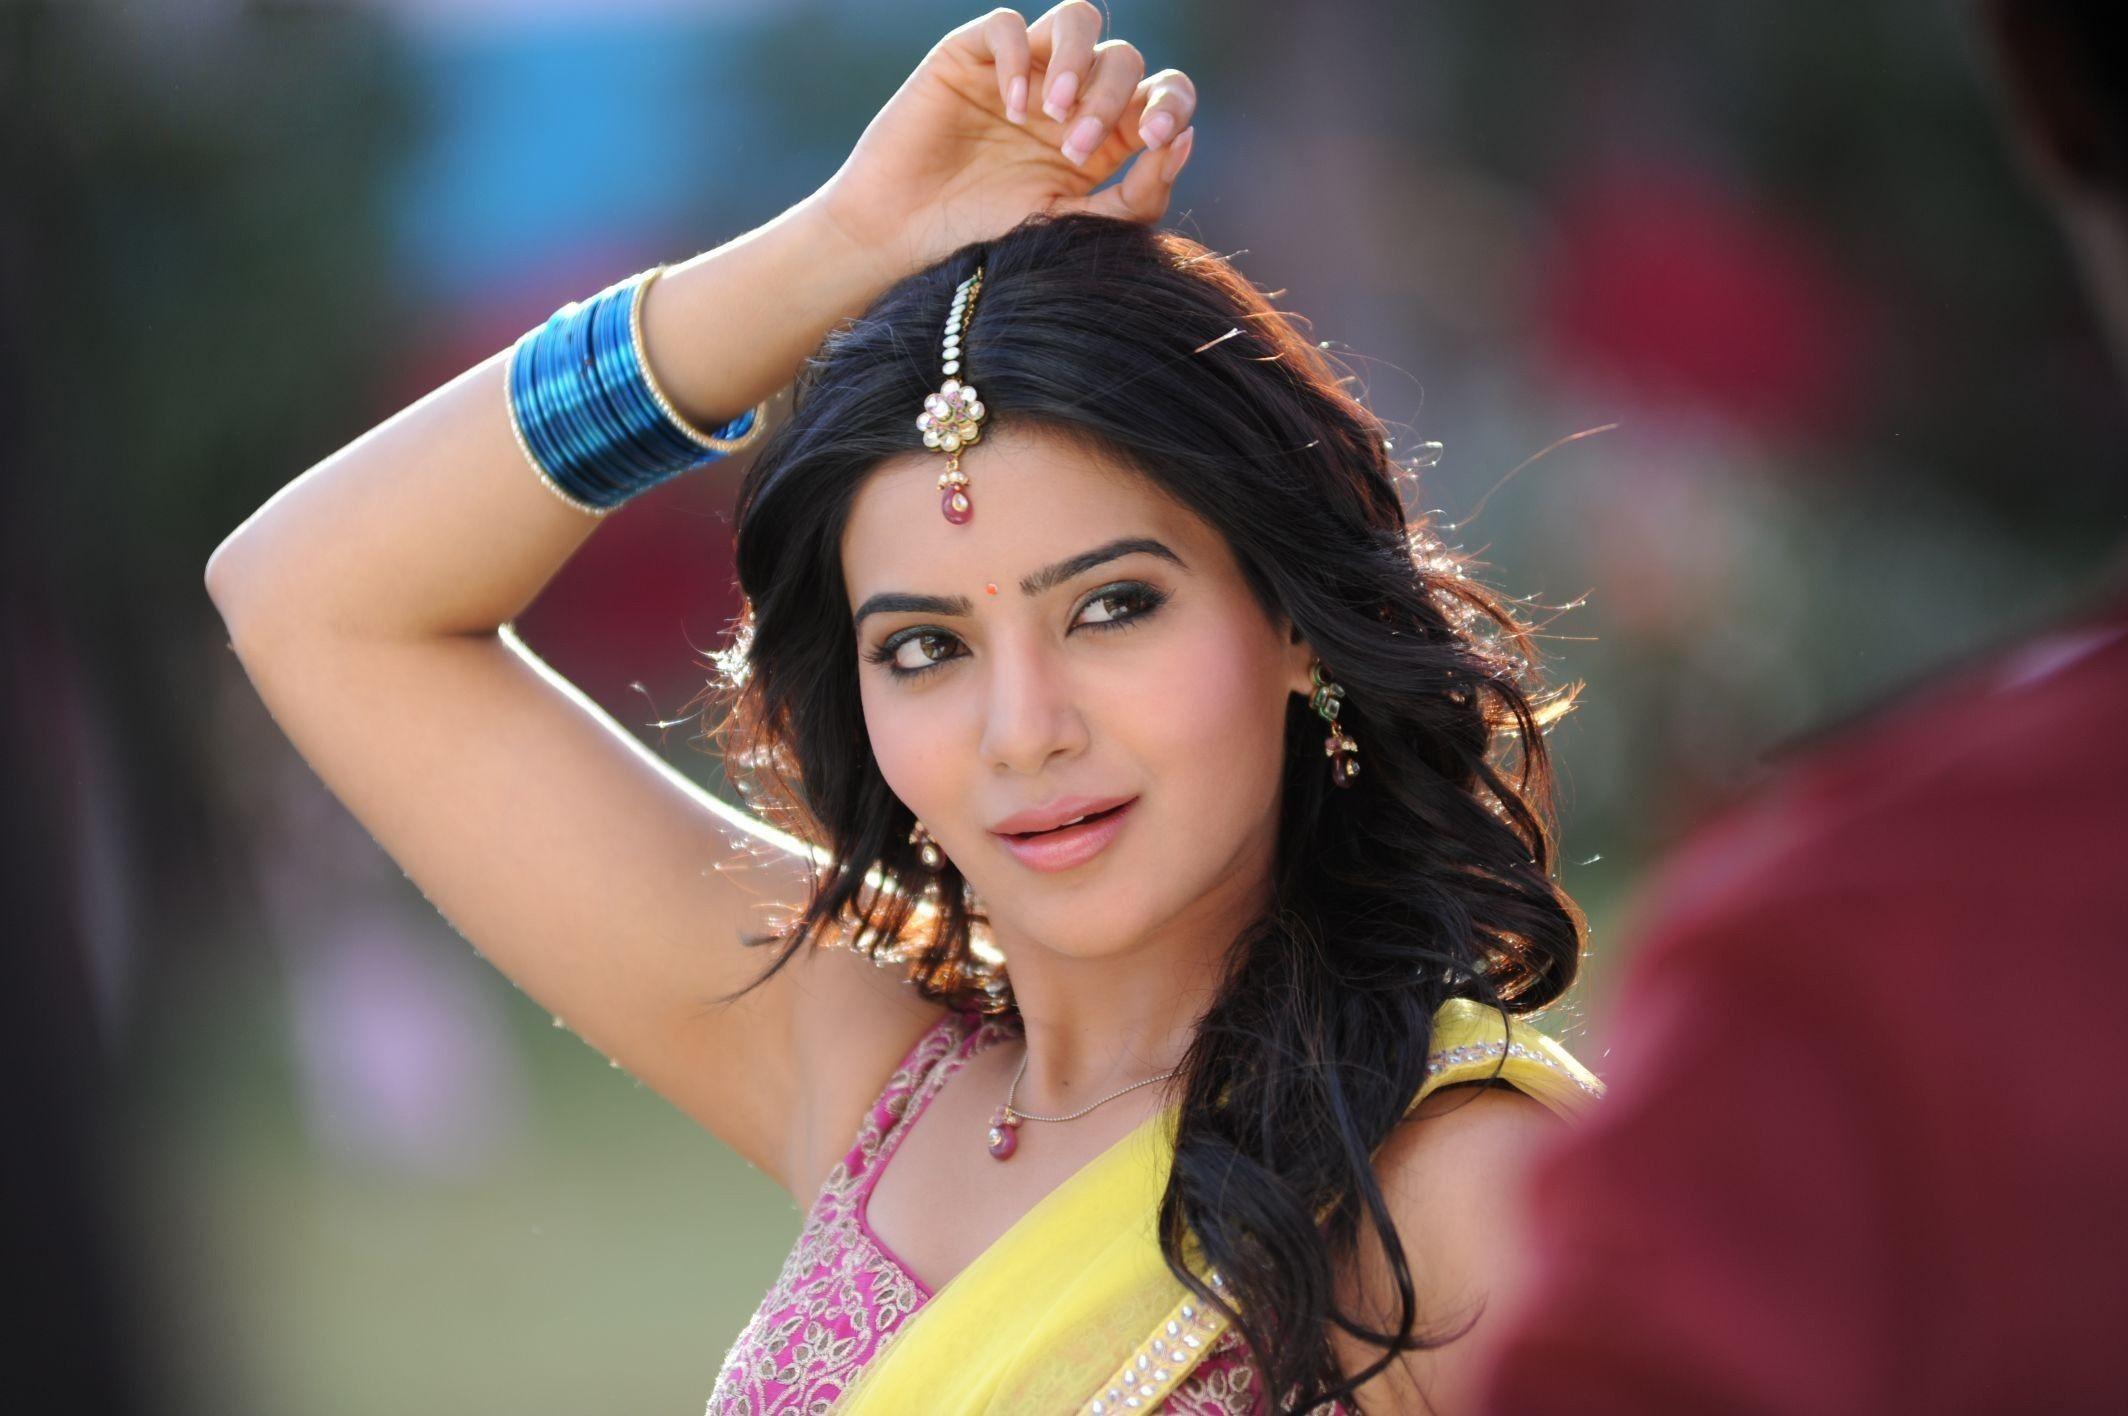 Neha Sharma Hot Indian Actress Wallpaper Hd Hiroin 44902 Hd Wallpaper Backgrounds Download